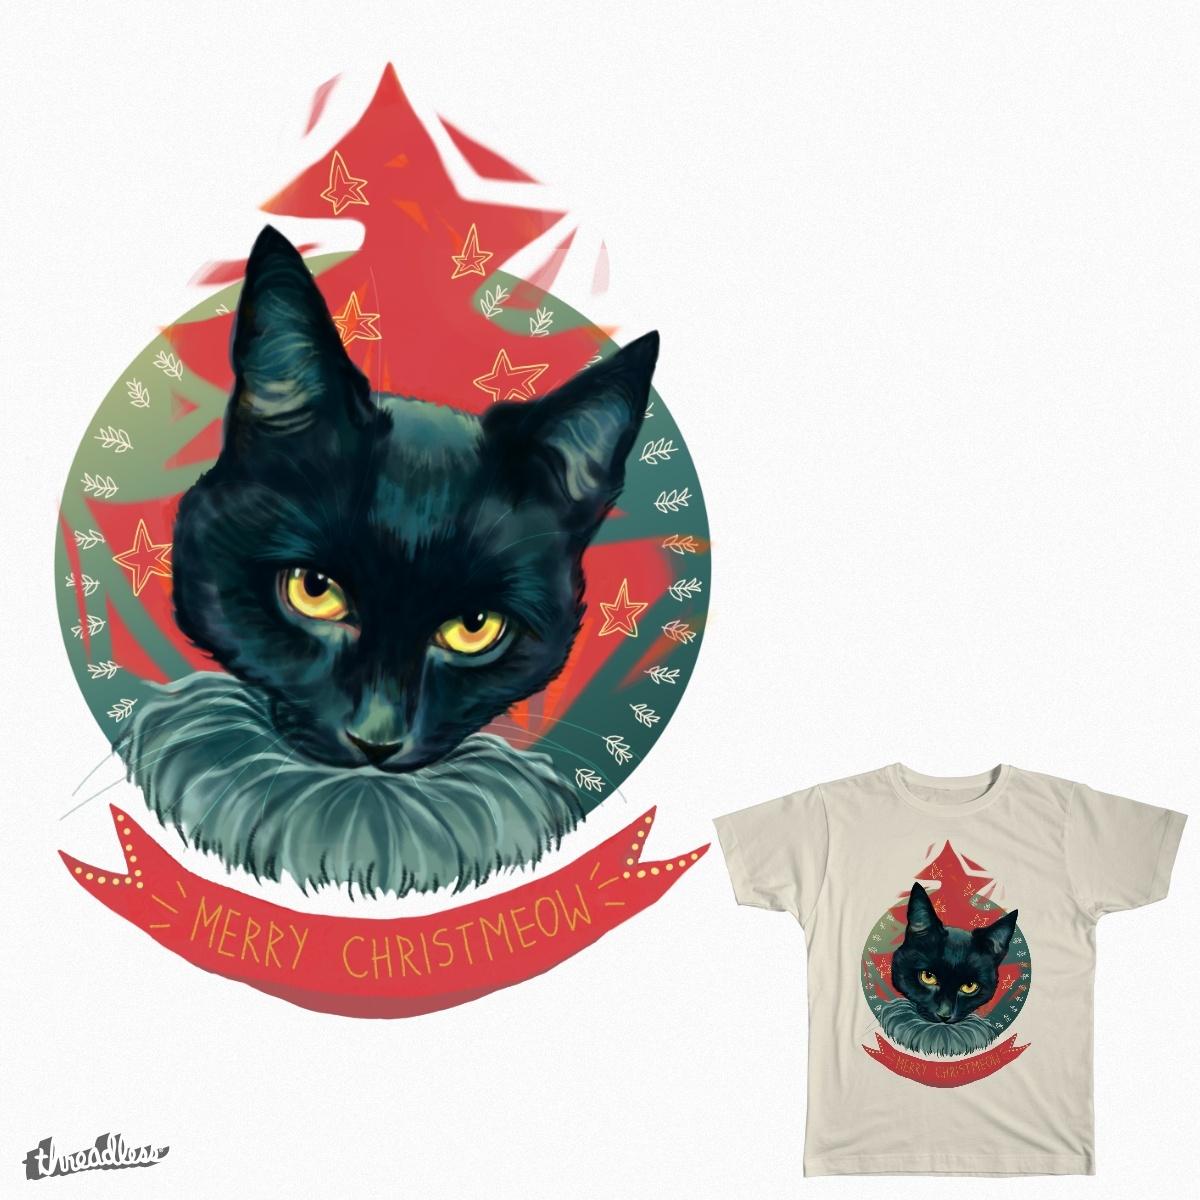 Merry Christmeow , a cool t-shirt design